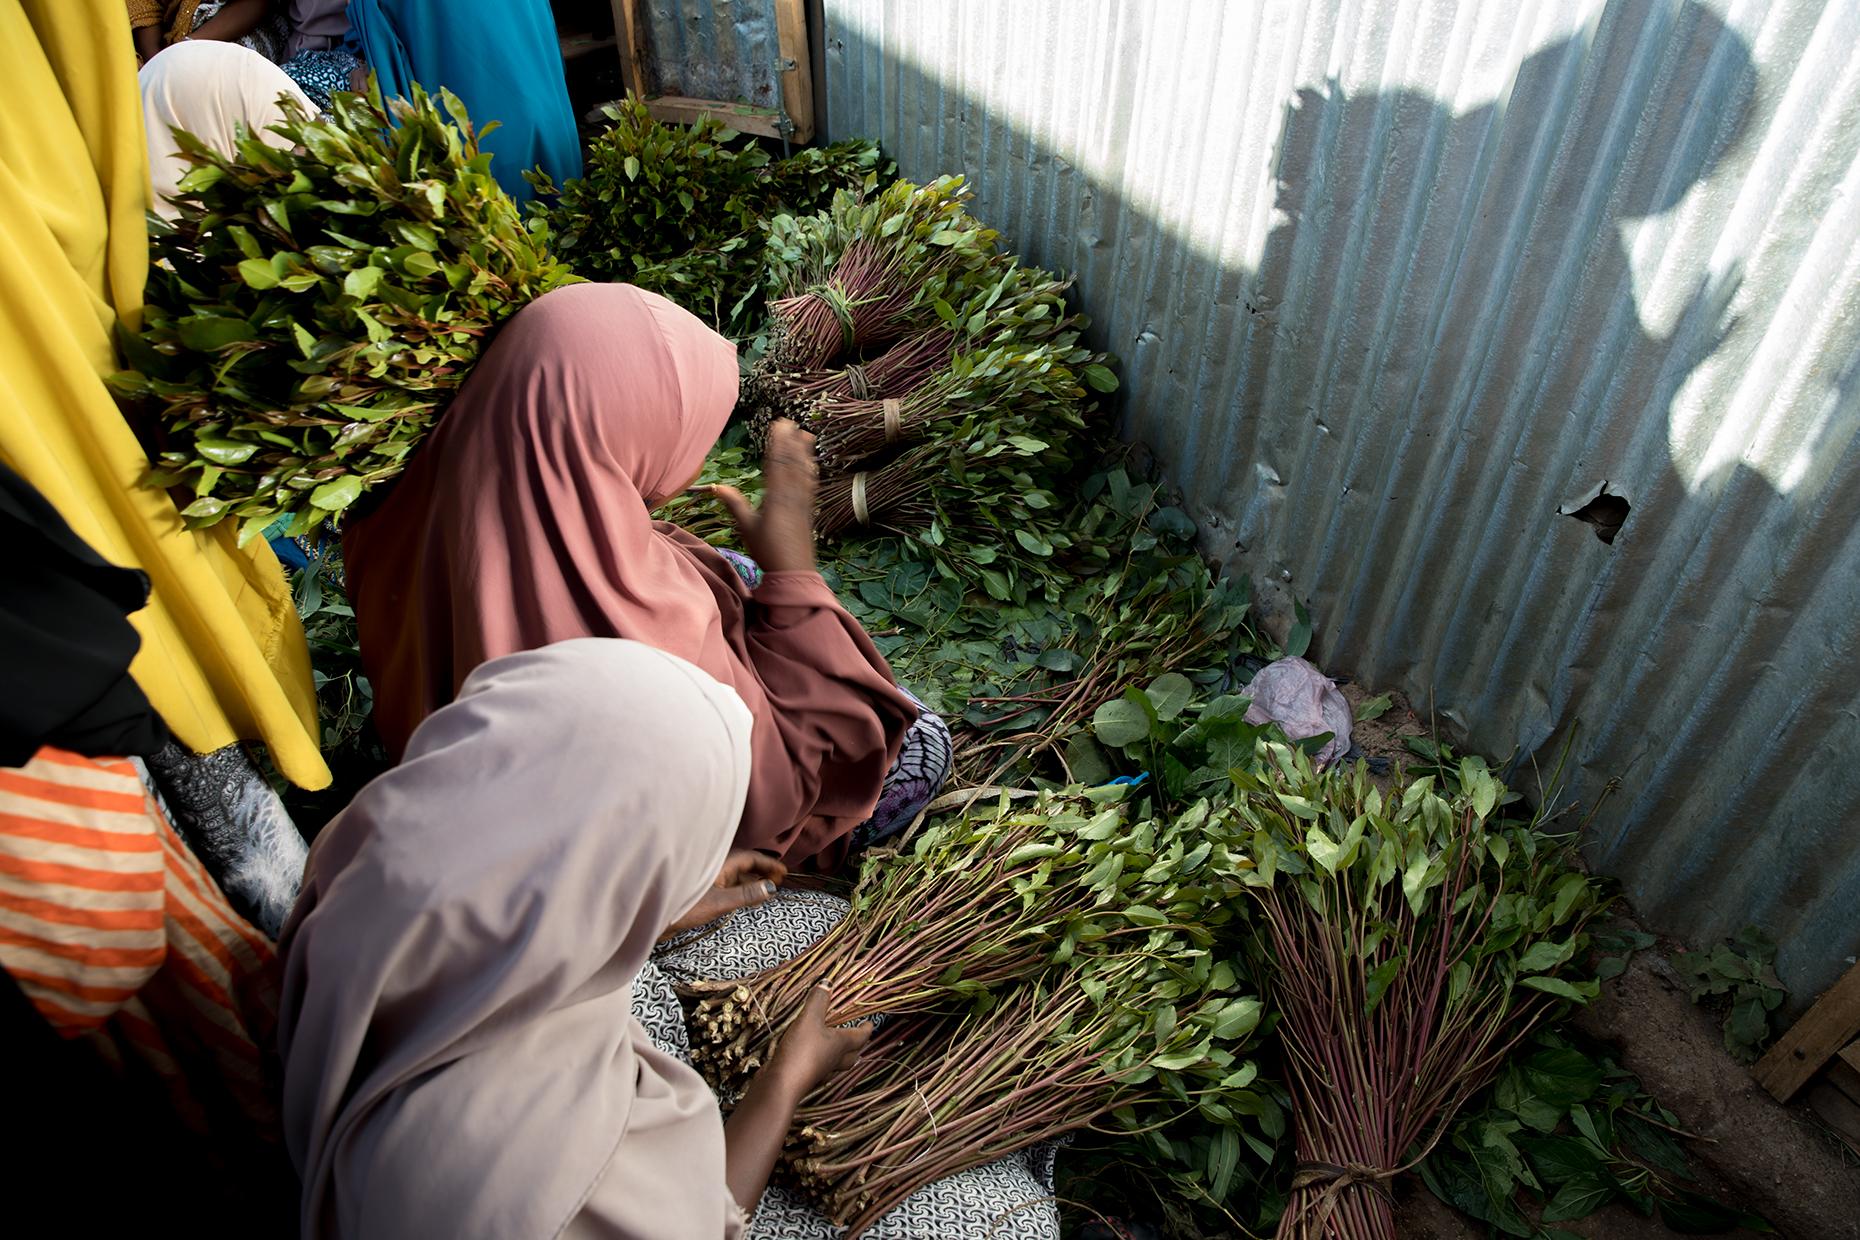 khat market ethiopia harar working women Awaday